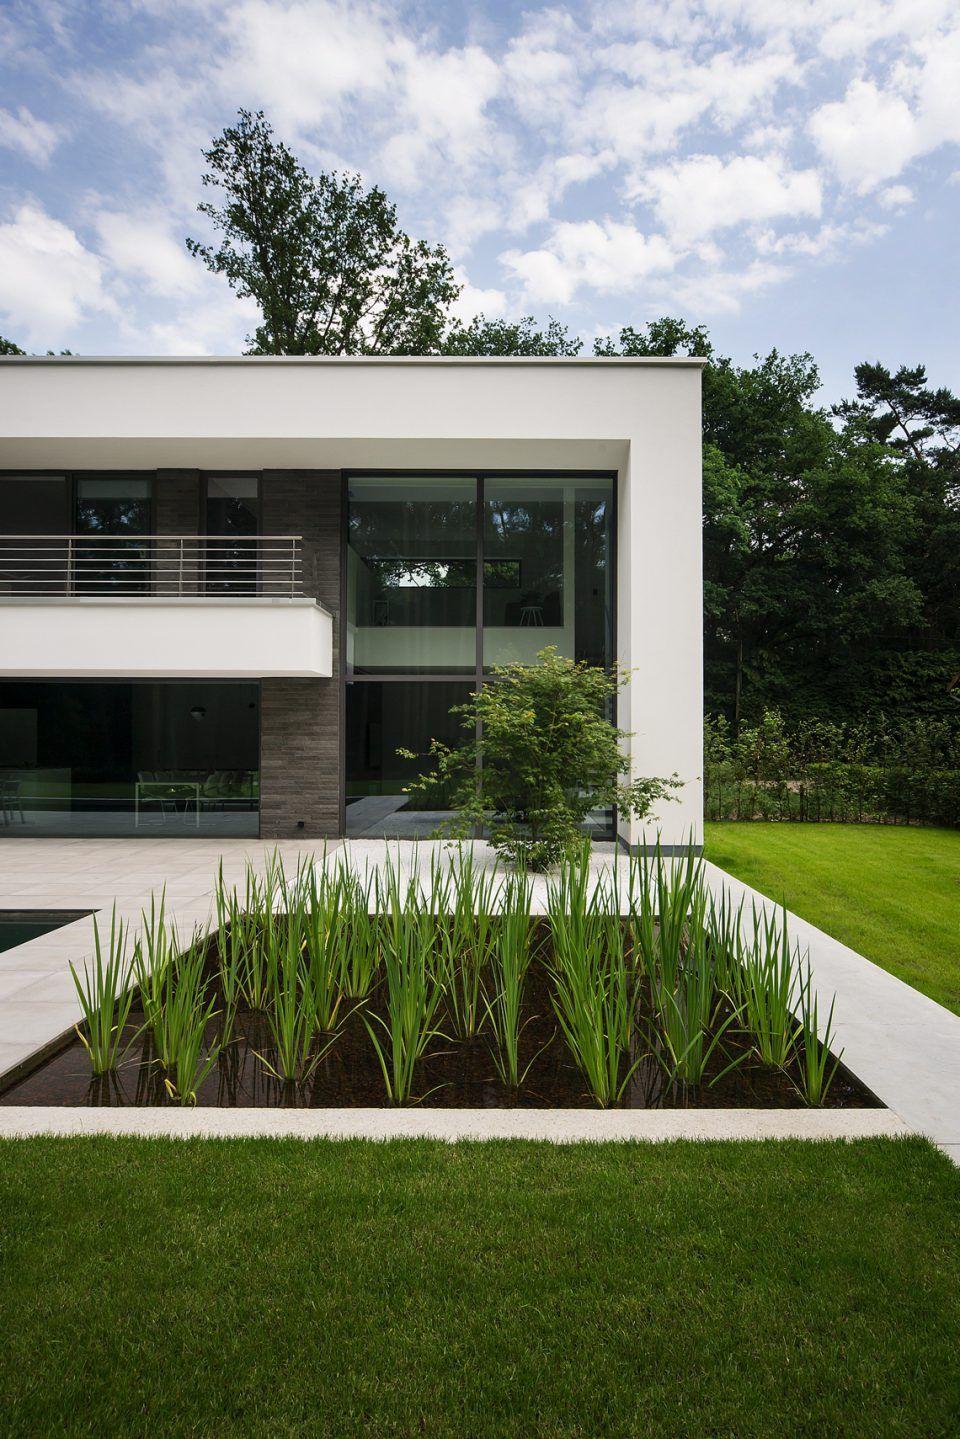 imore interieur architectuur - Moderne villa Antwerpse Kempen ...